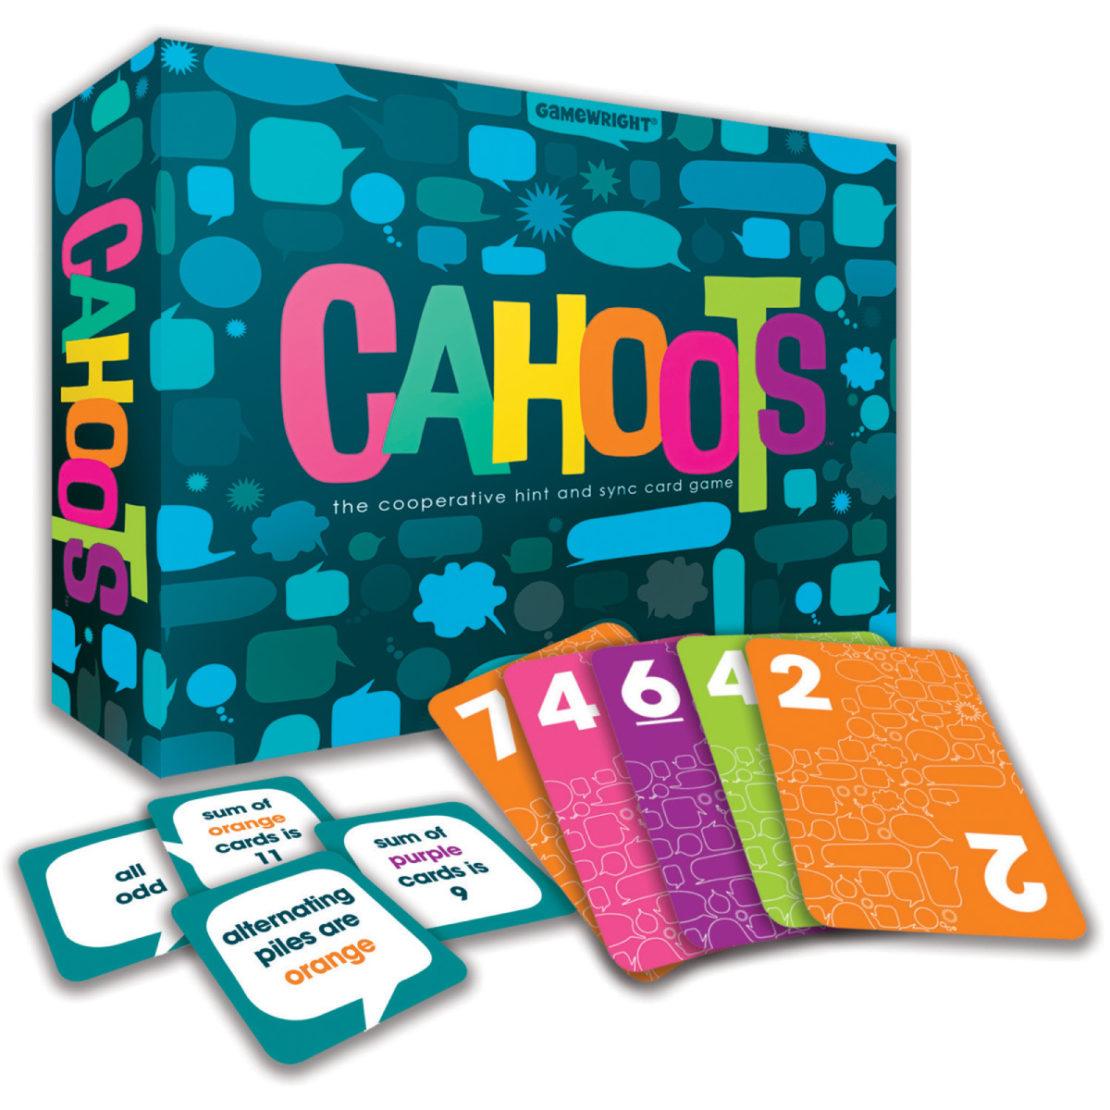 Cahoots Box